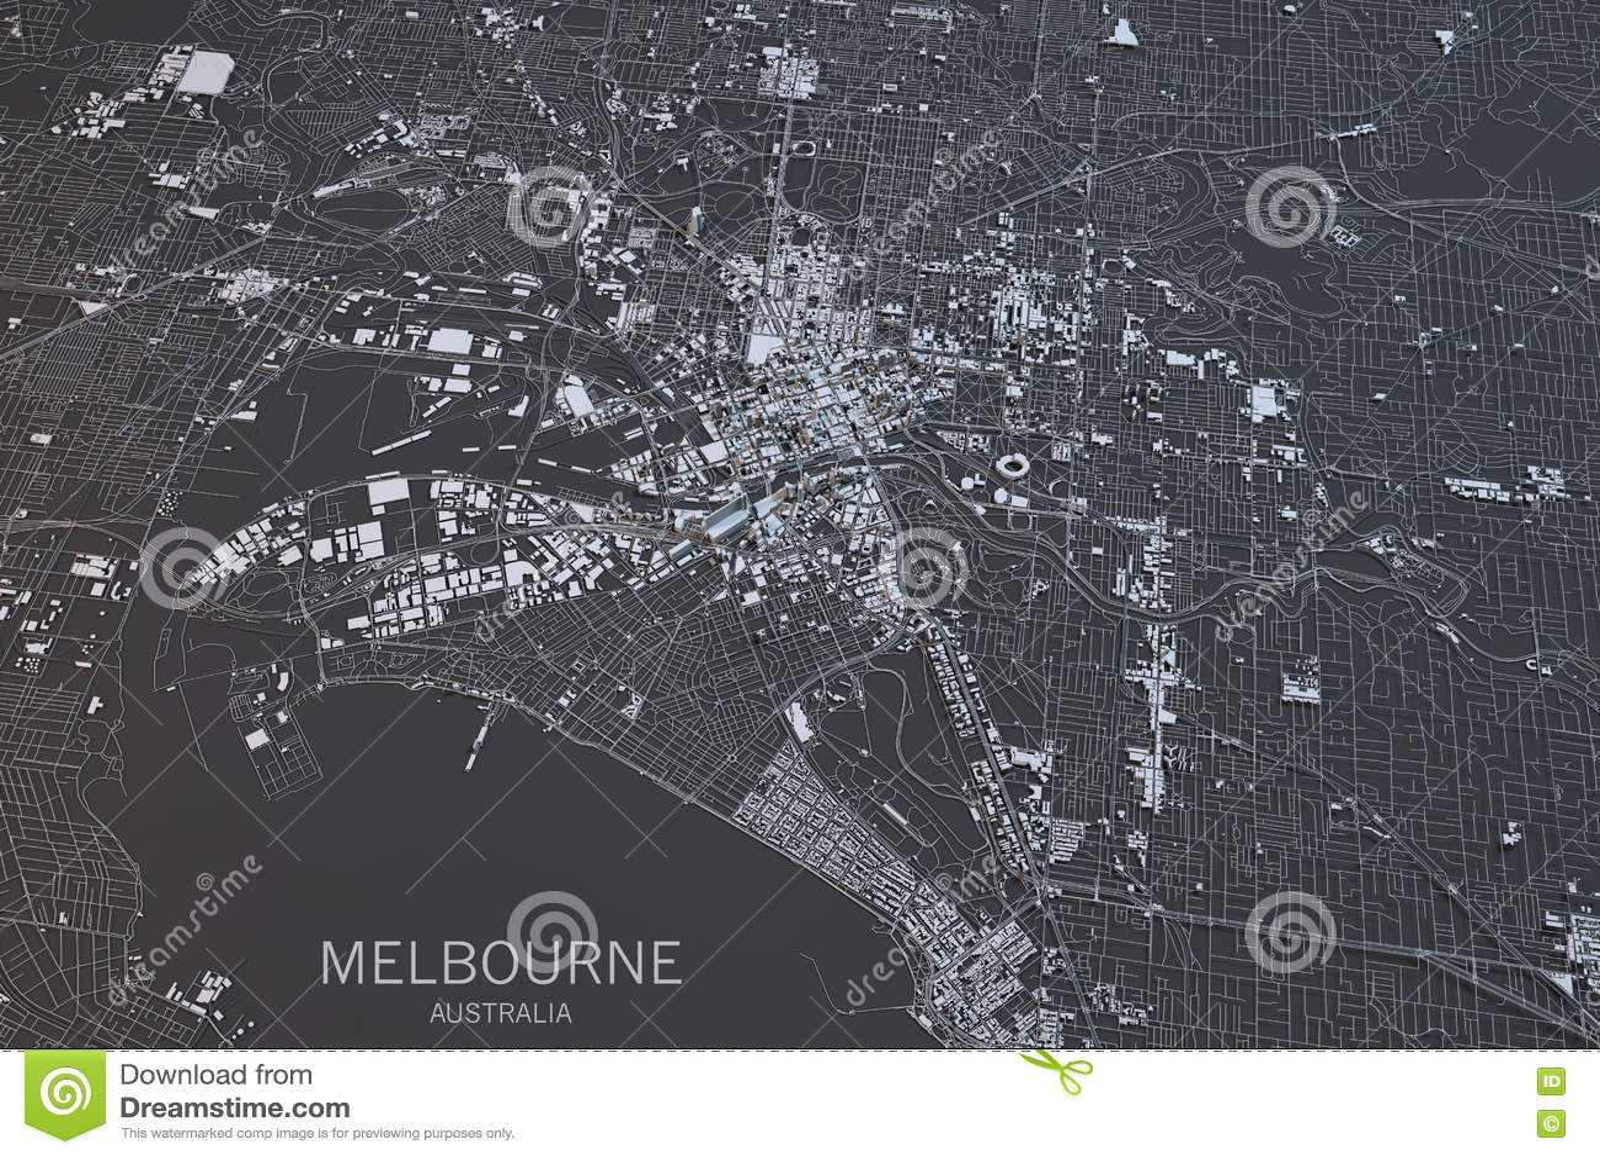 Australia Map Satellite.Melbourne Map Satellite View City Australia Stock Illustration